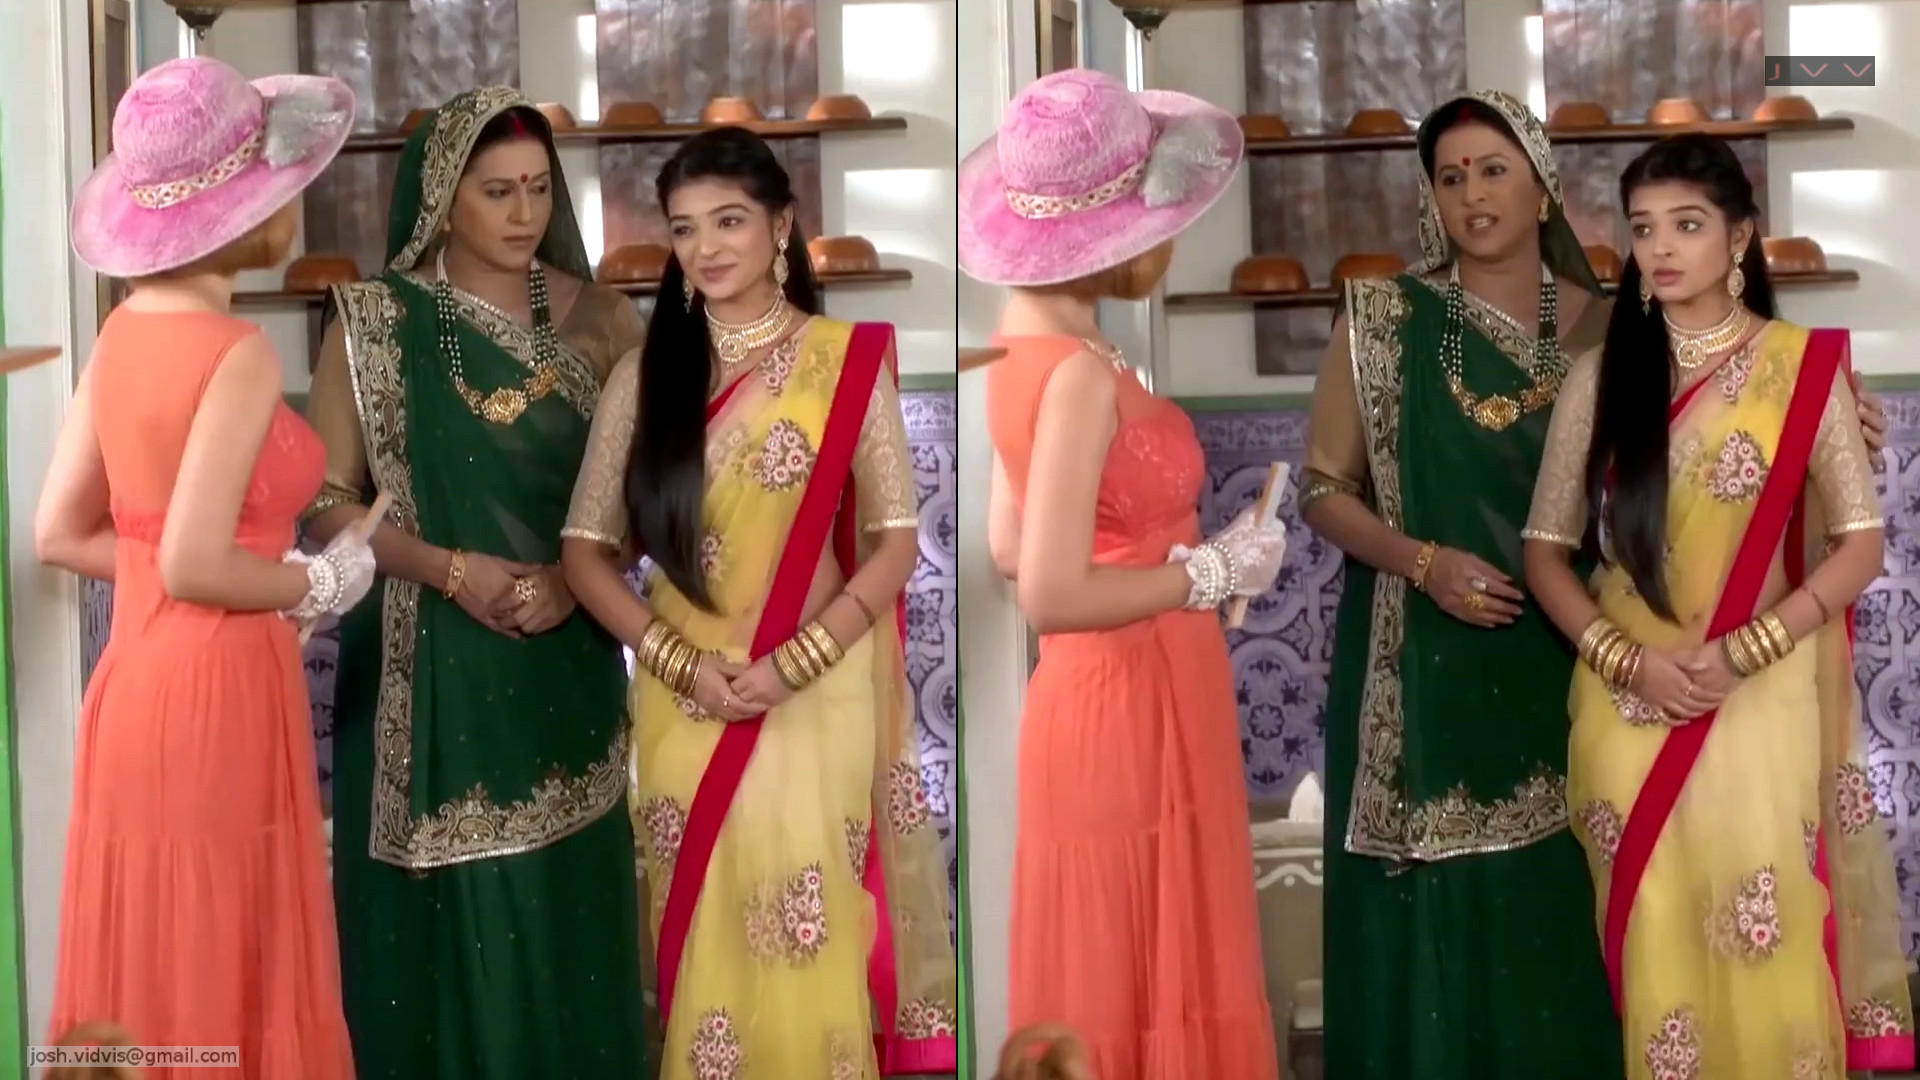 Ketki kadam Hindi TV hot saree navel show hd caps